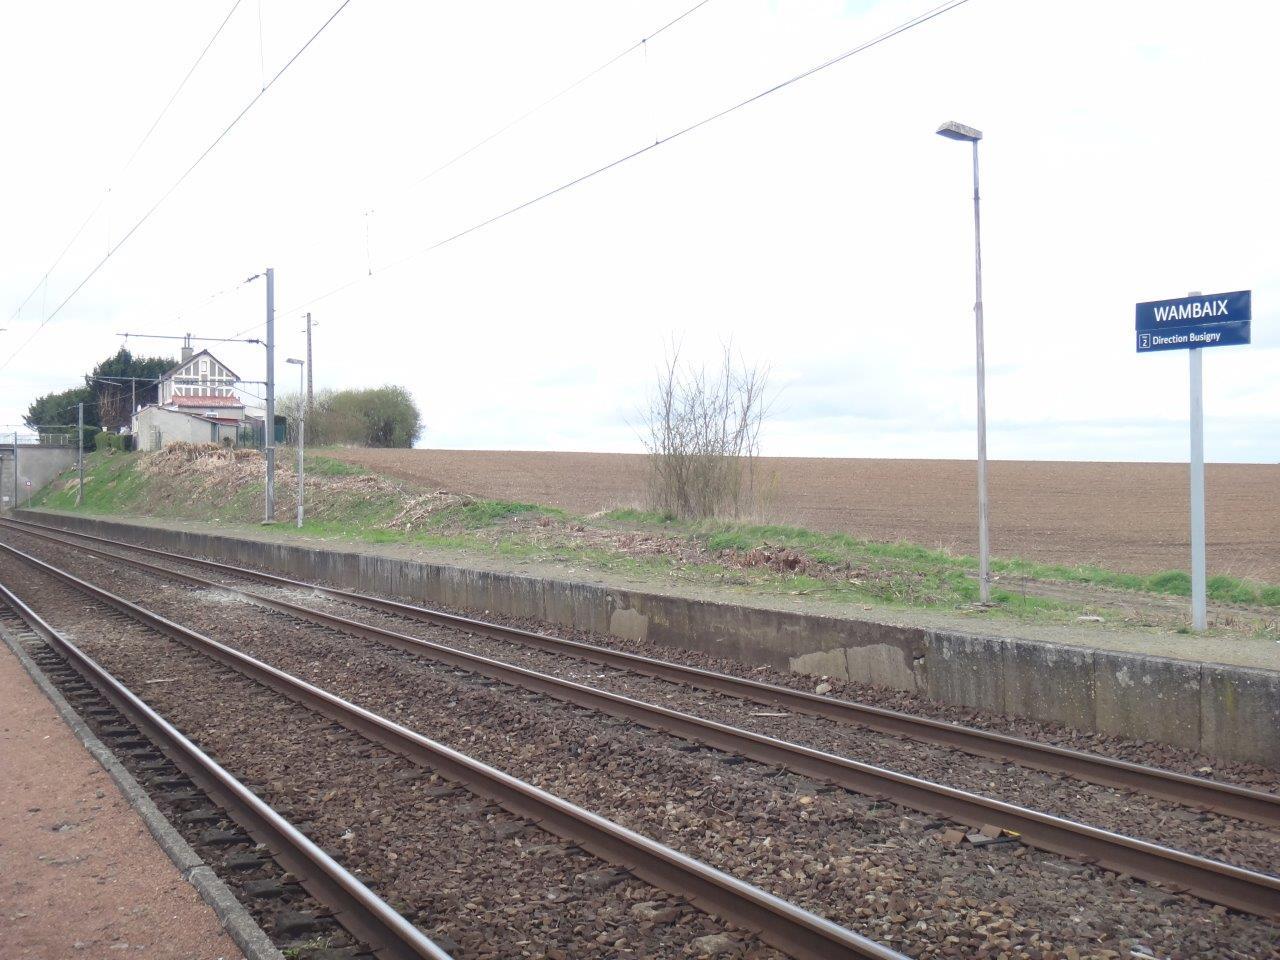 gare-de-wambaix-train-station